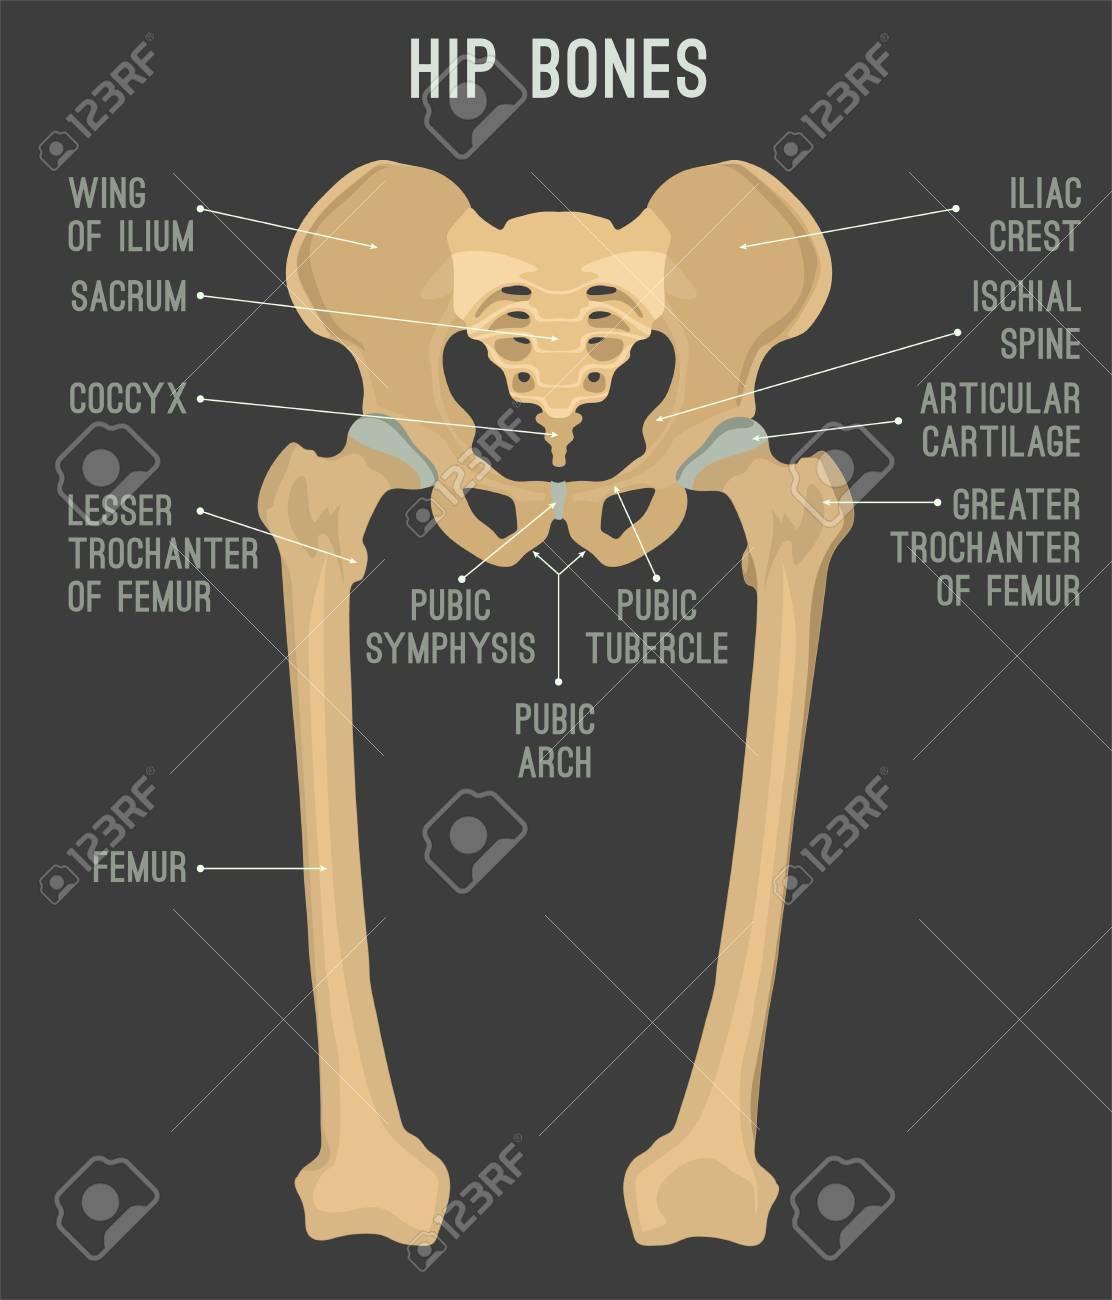 Human Male Anatomy Scheme. Main Hip Bones - Sacrum, Ilium, Coccyx ...